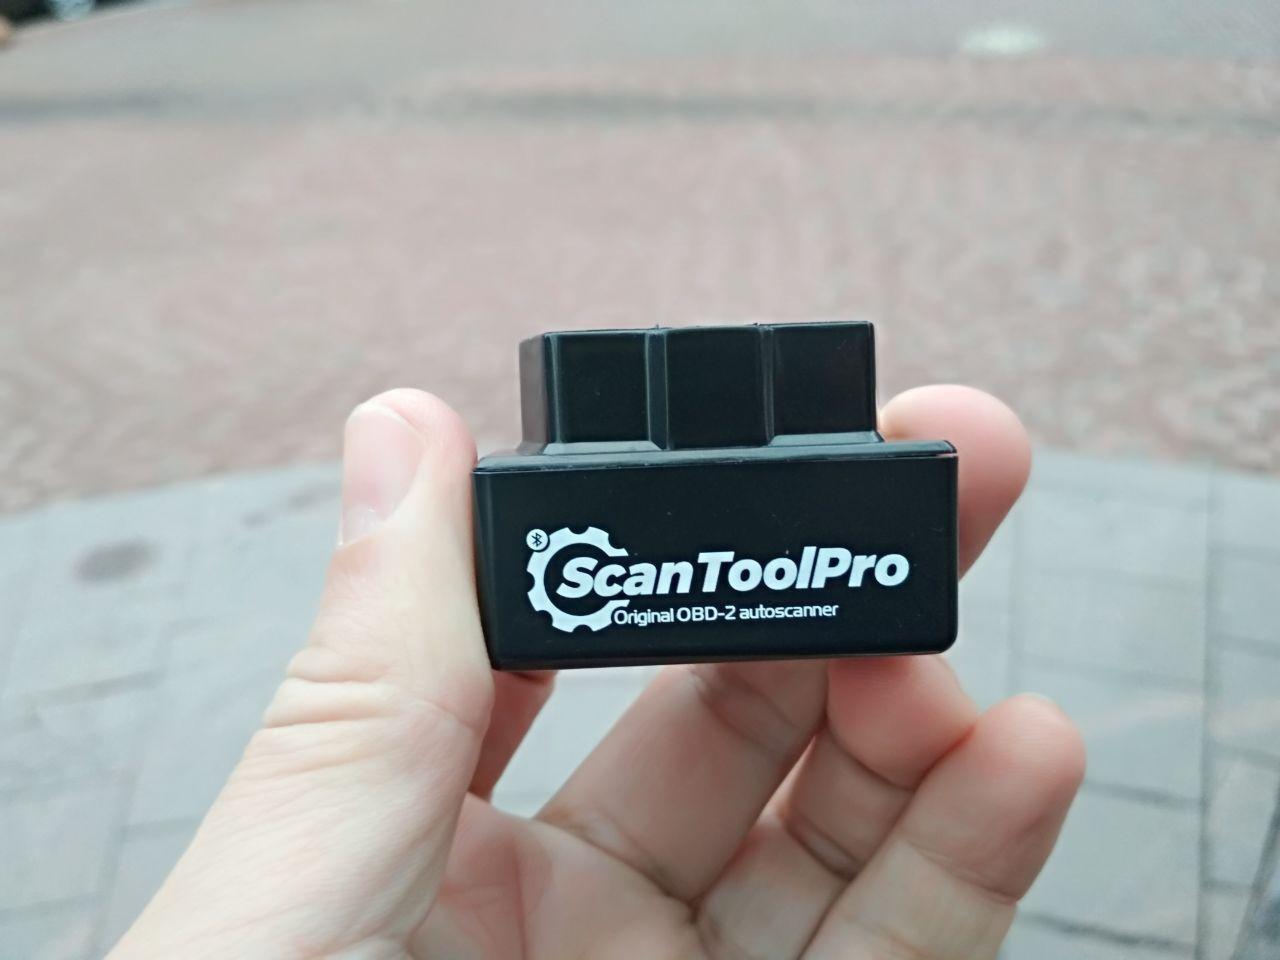 Scan Tool Pro